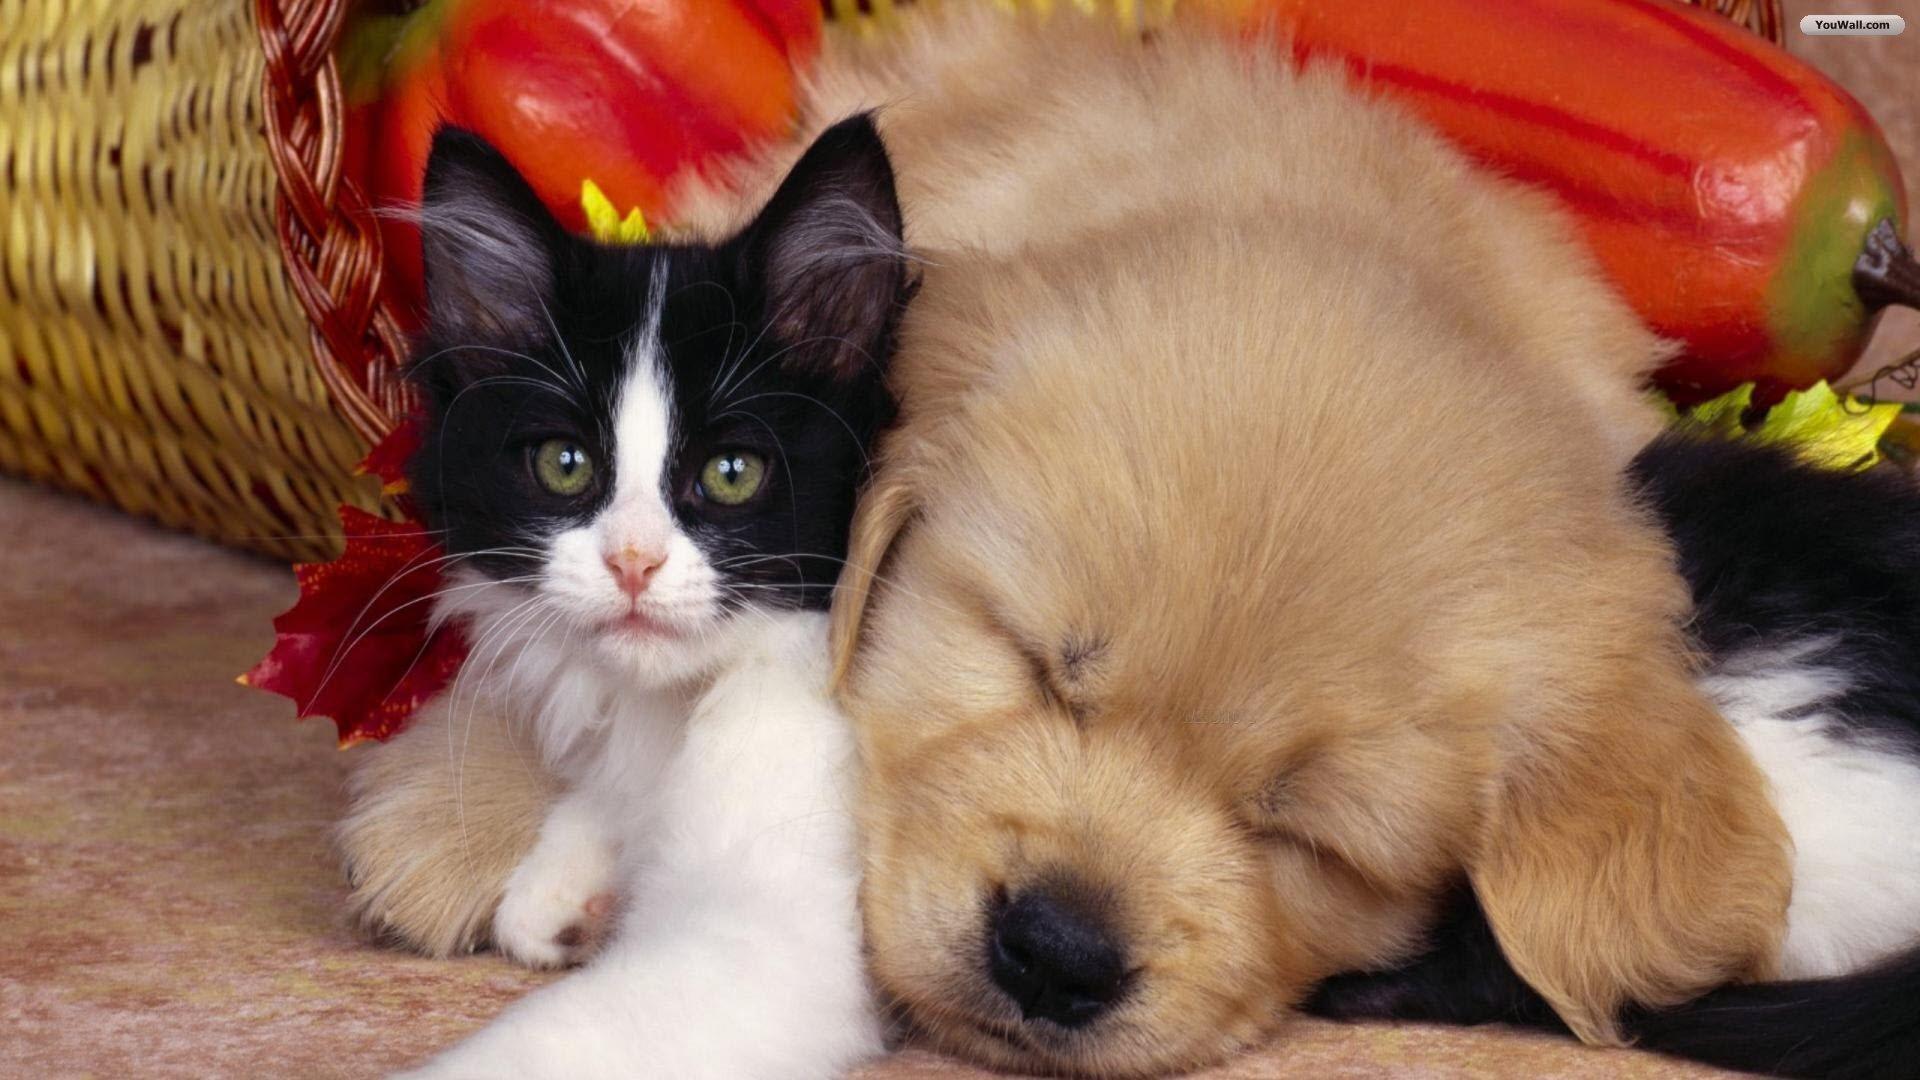 Cute-cat-and-dog-wallpaper